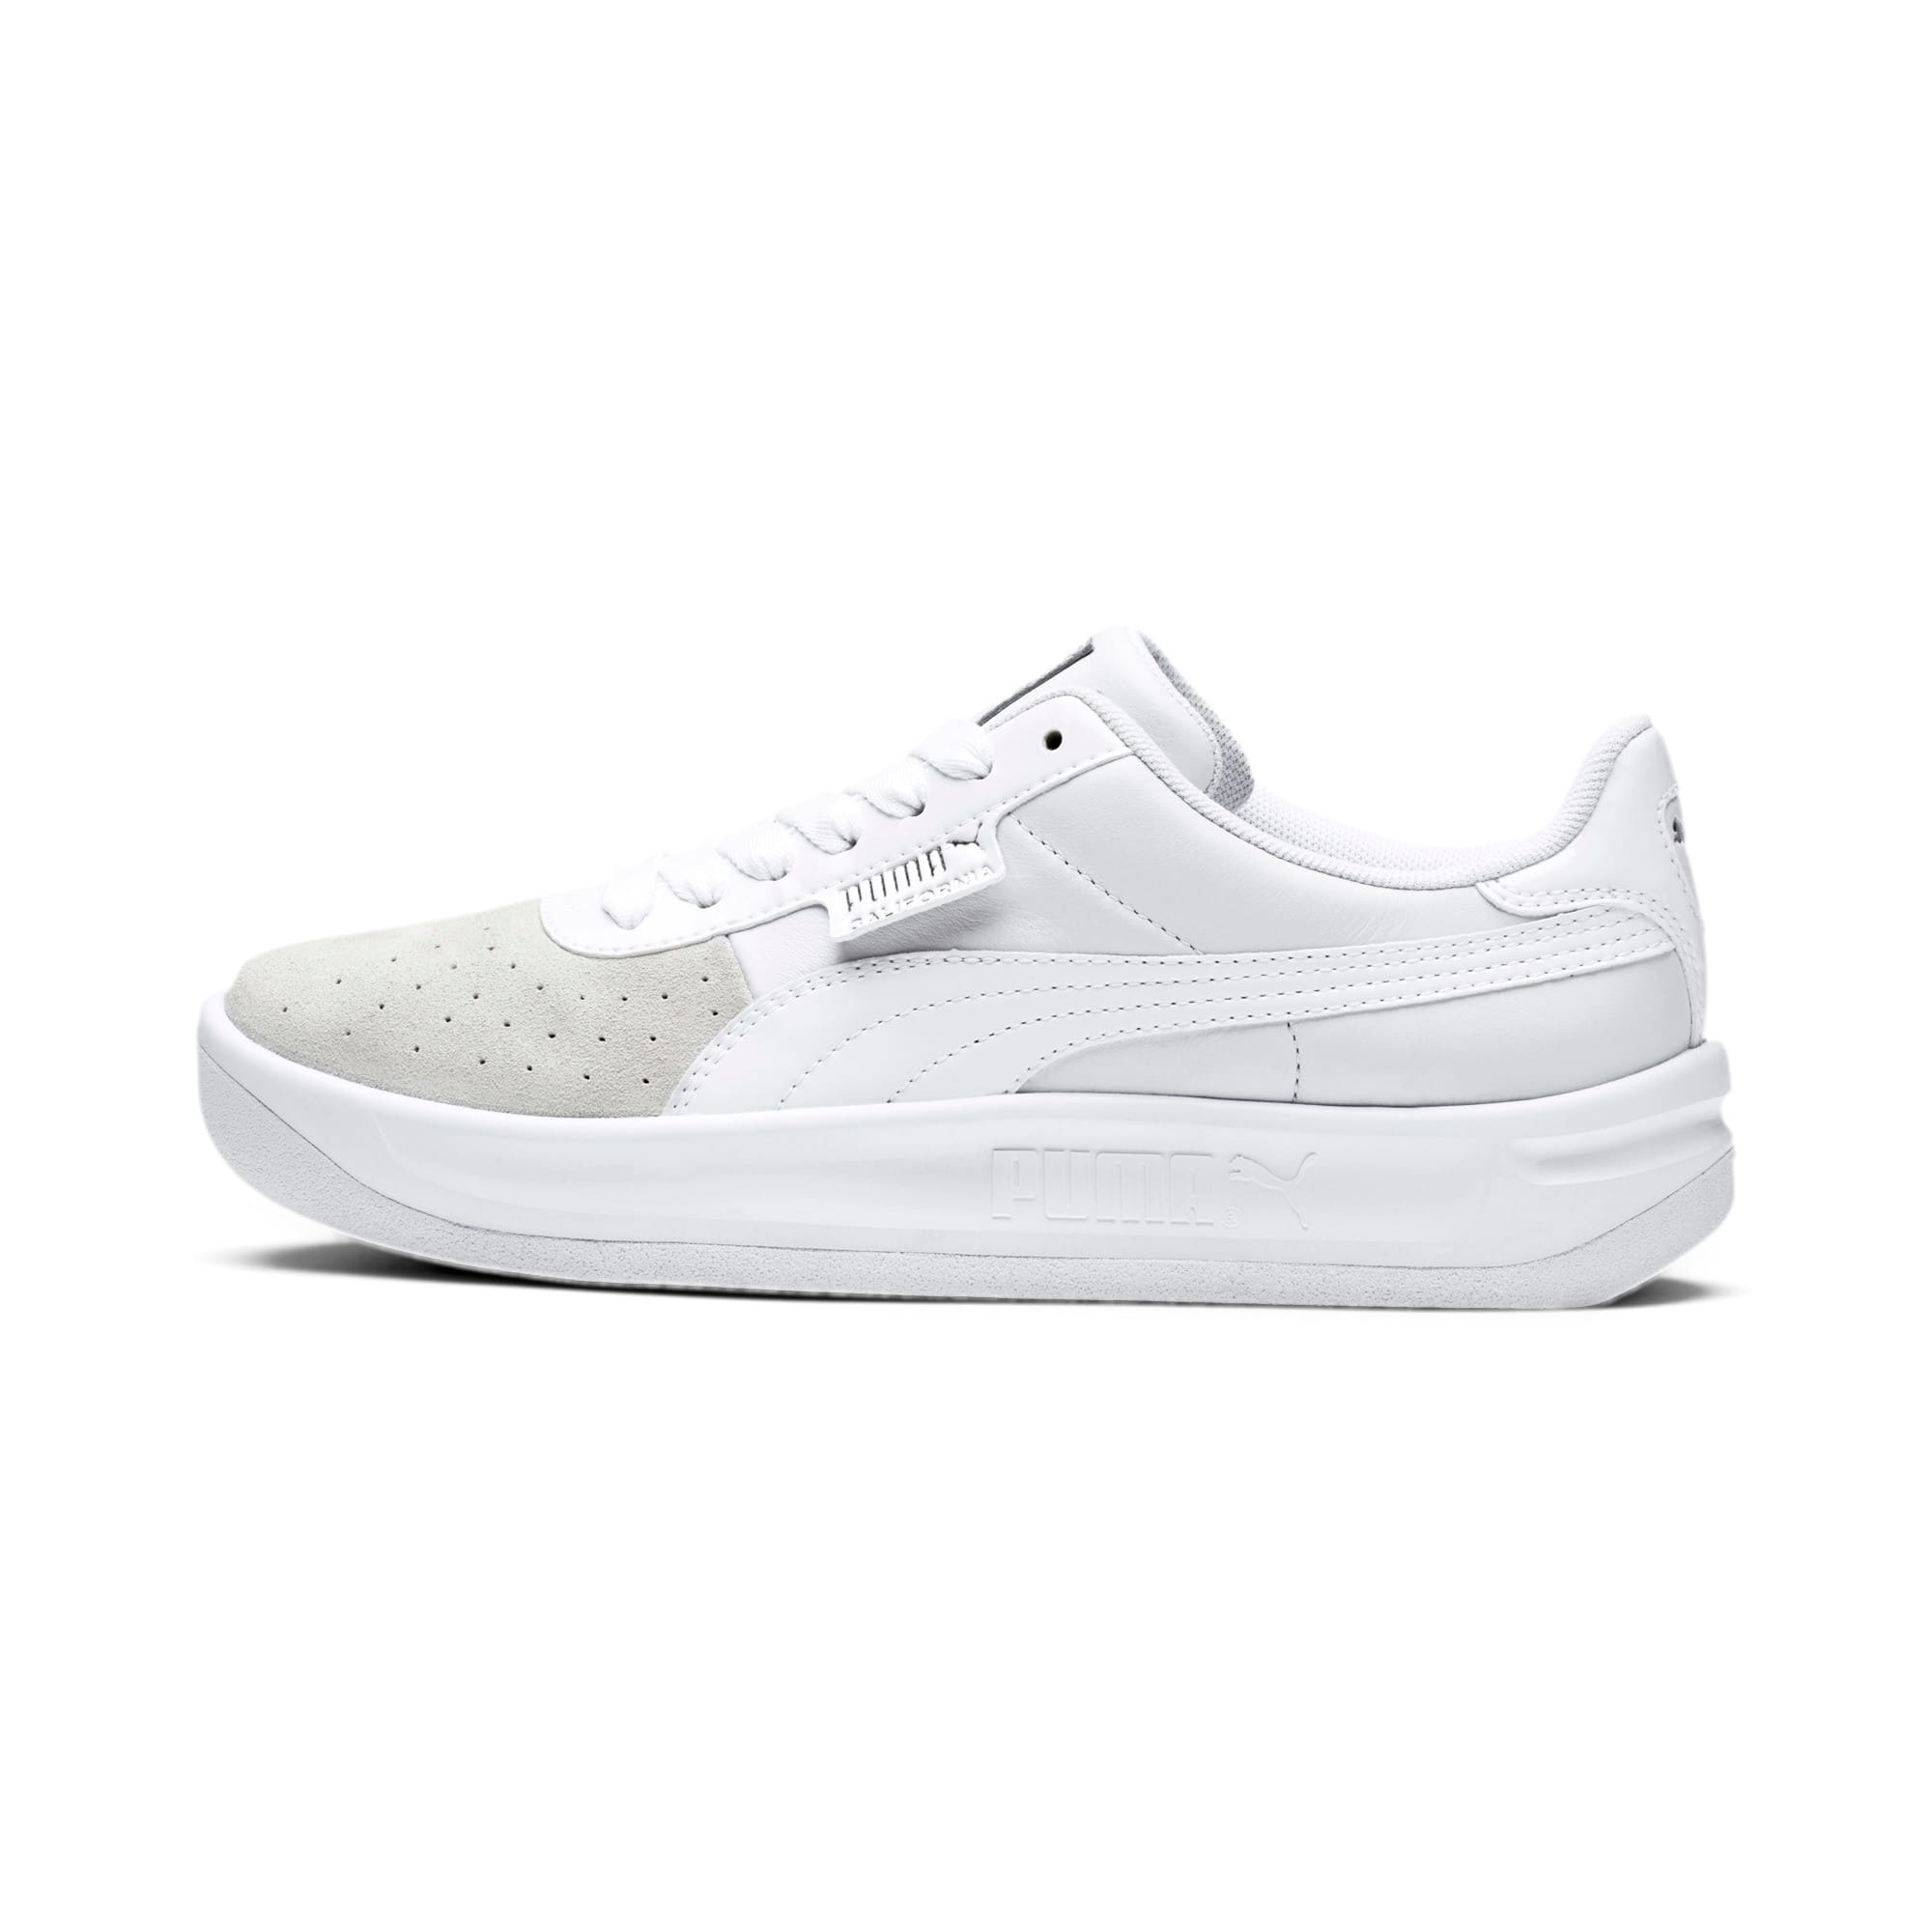 Thumbnail 1 of California Monochrome Women's Sneakers, Puma White-Puma Silver, medium